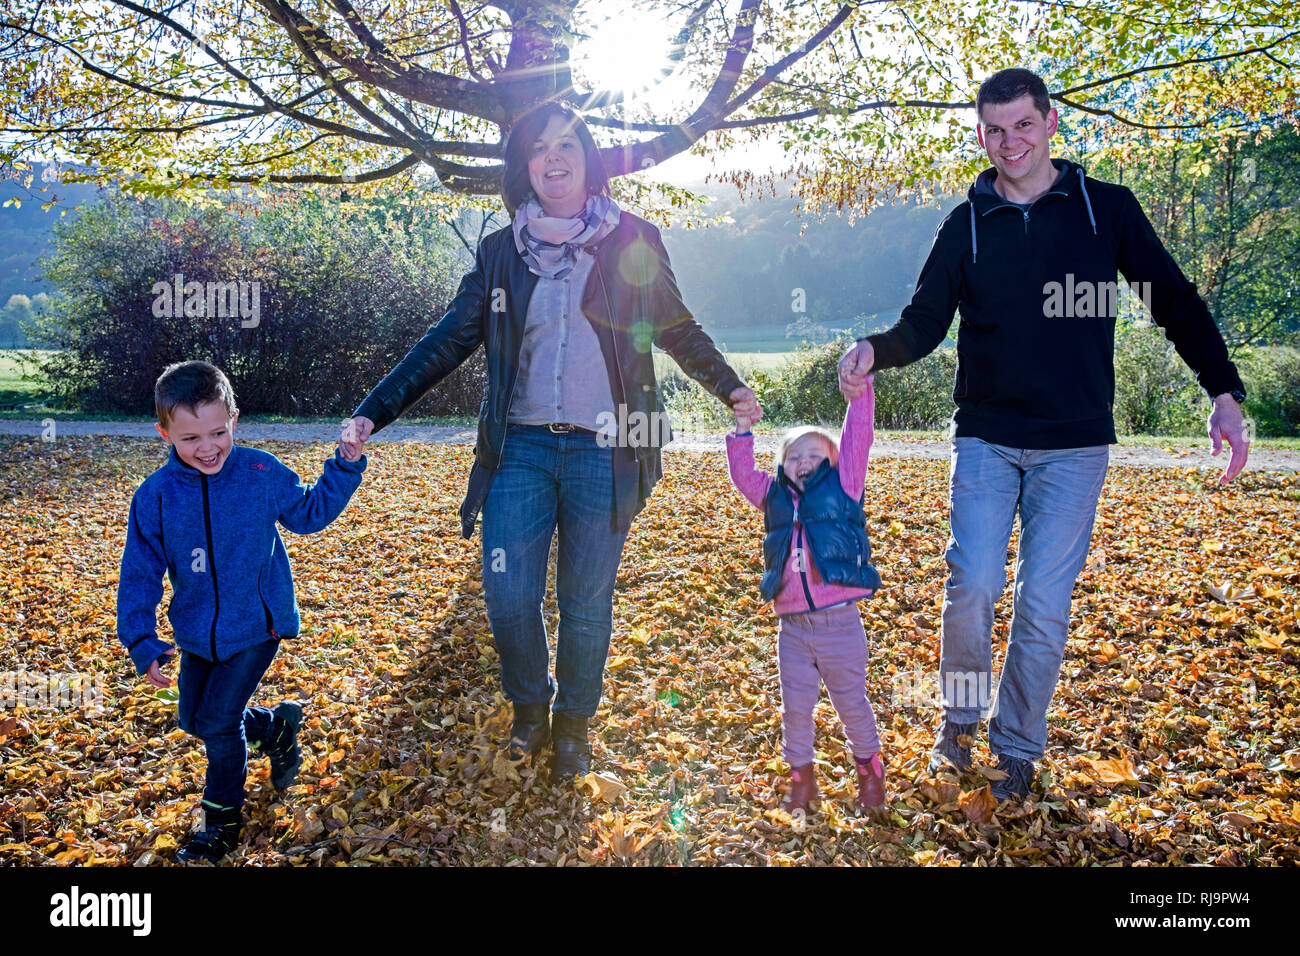 Familie beim Herbstspaziergang, Park, Herbstausflug, Herbsttag, Bad Kissingen, Bayern, - Stock Image